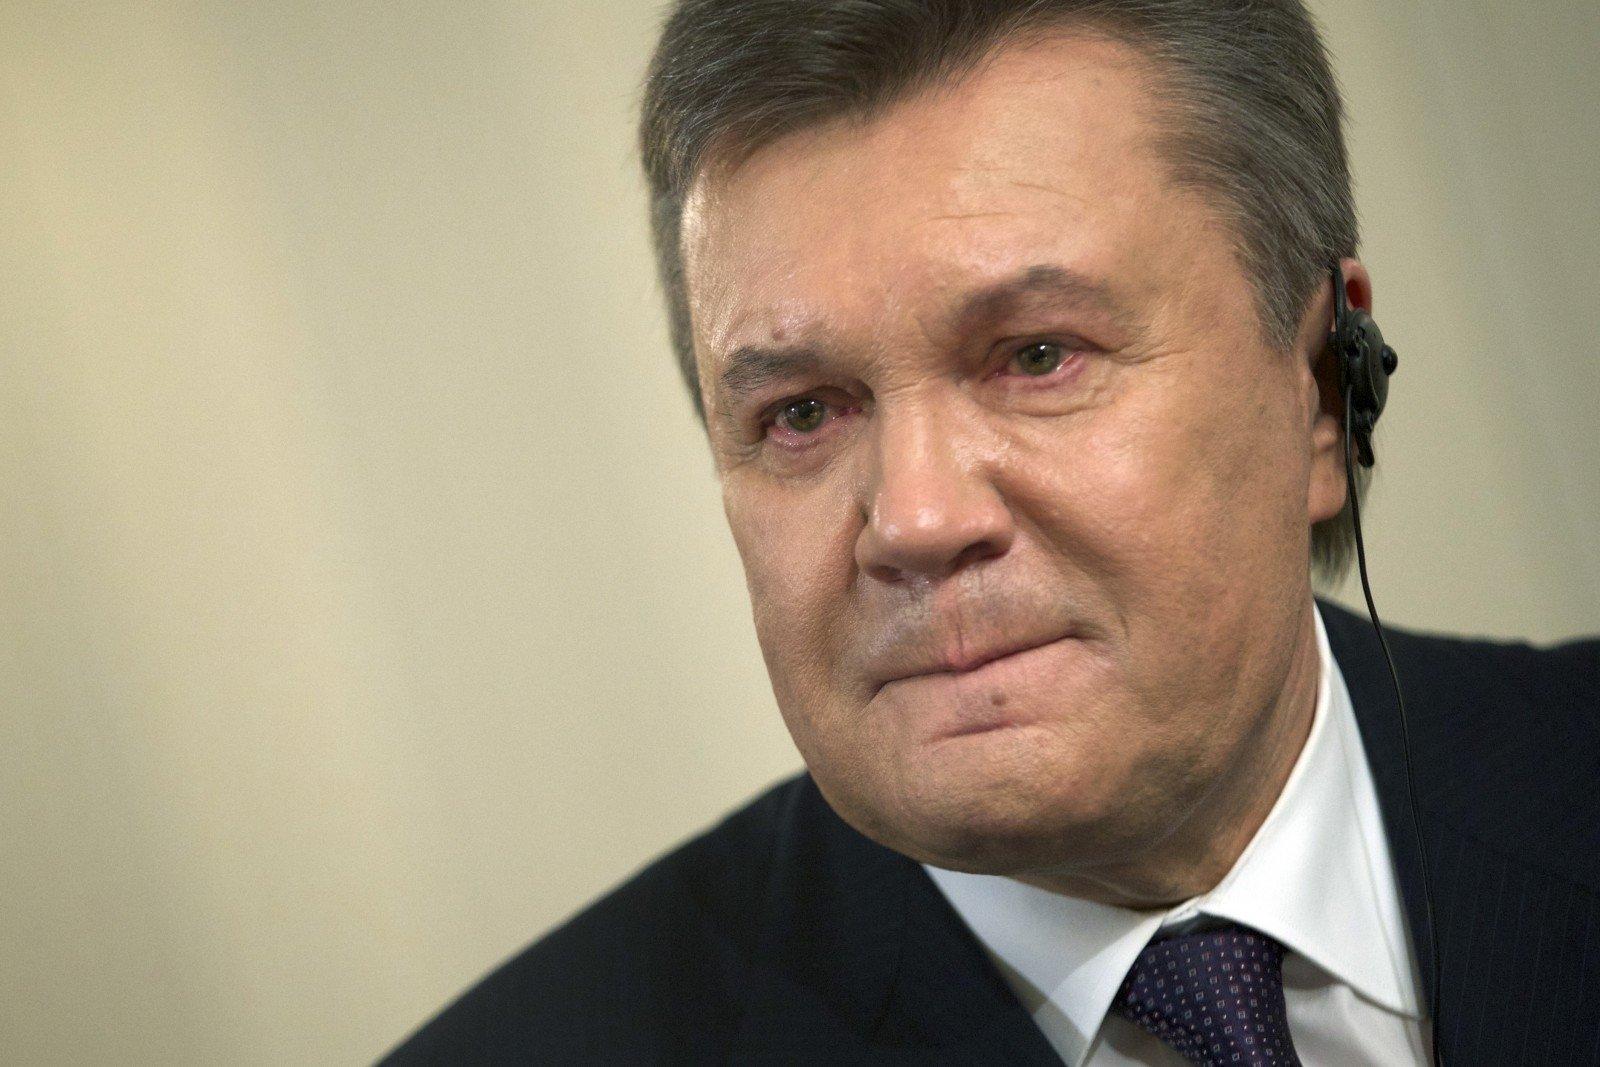 Суд завершил видеодопрос Януковича, тот объявил оготовности ксотрудничеству